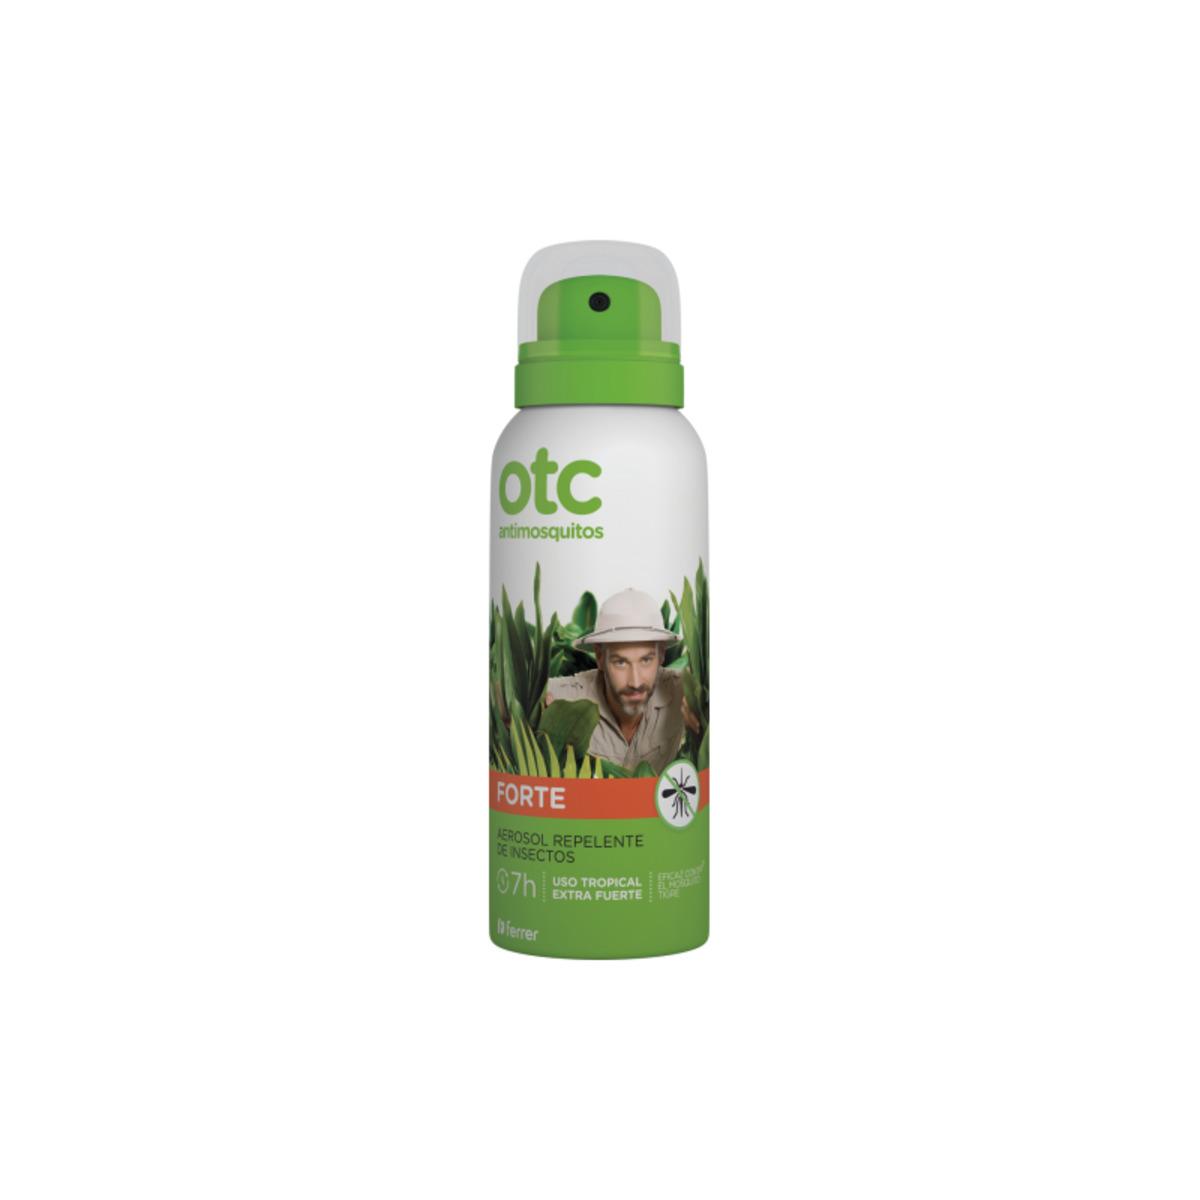 OTC Antimosquitos Forte Aerosol - Repelente De Mosquitos - 100ml